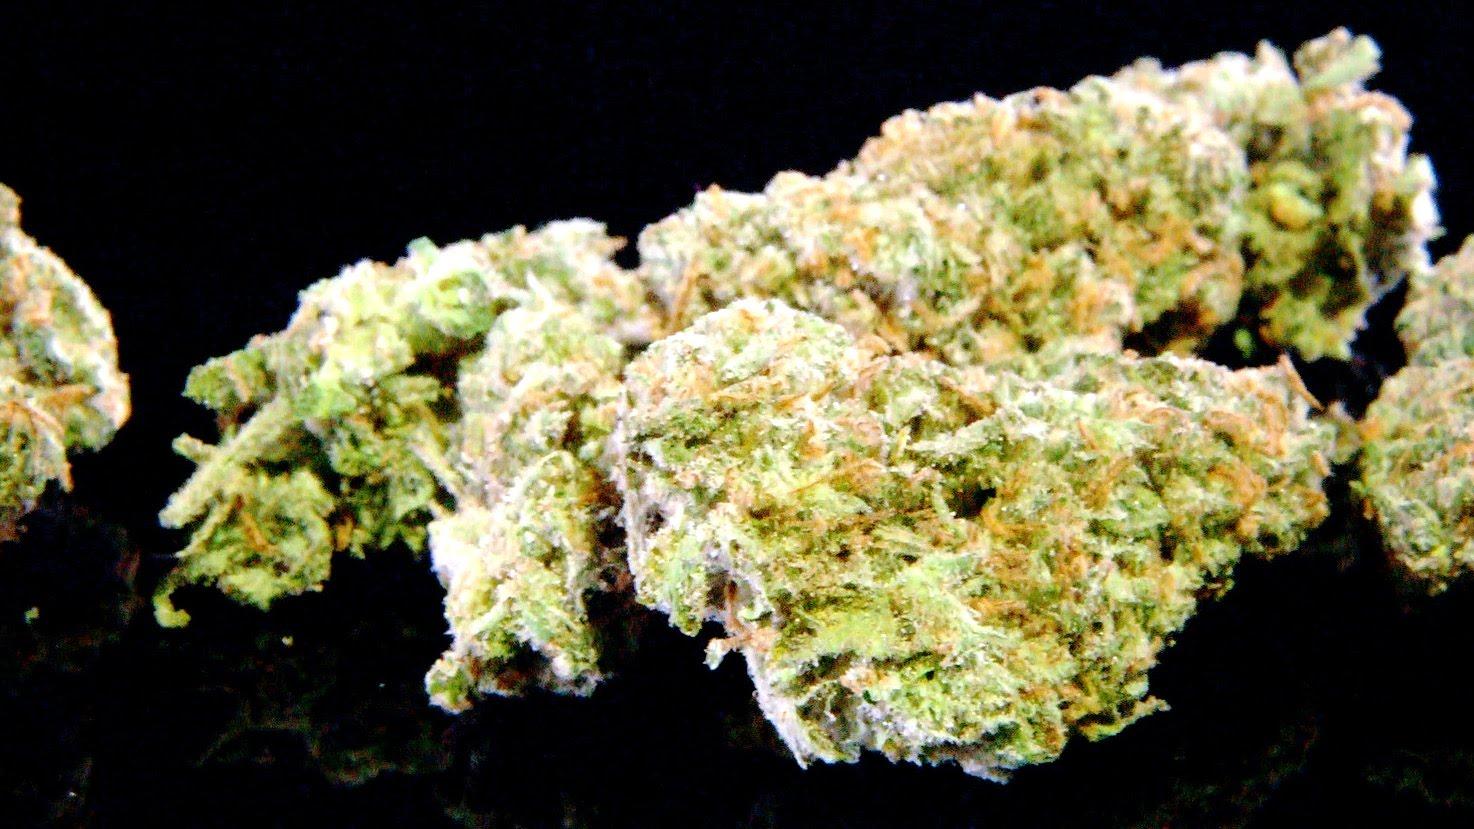 Cannabis Up Close #9: XJ-13 (Hybrid) THC Designs grown from Club 30 LA